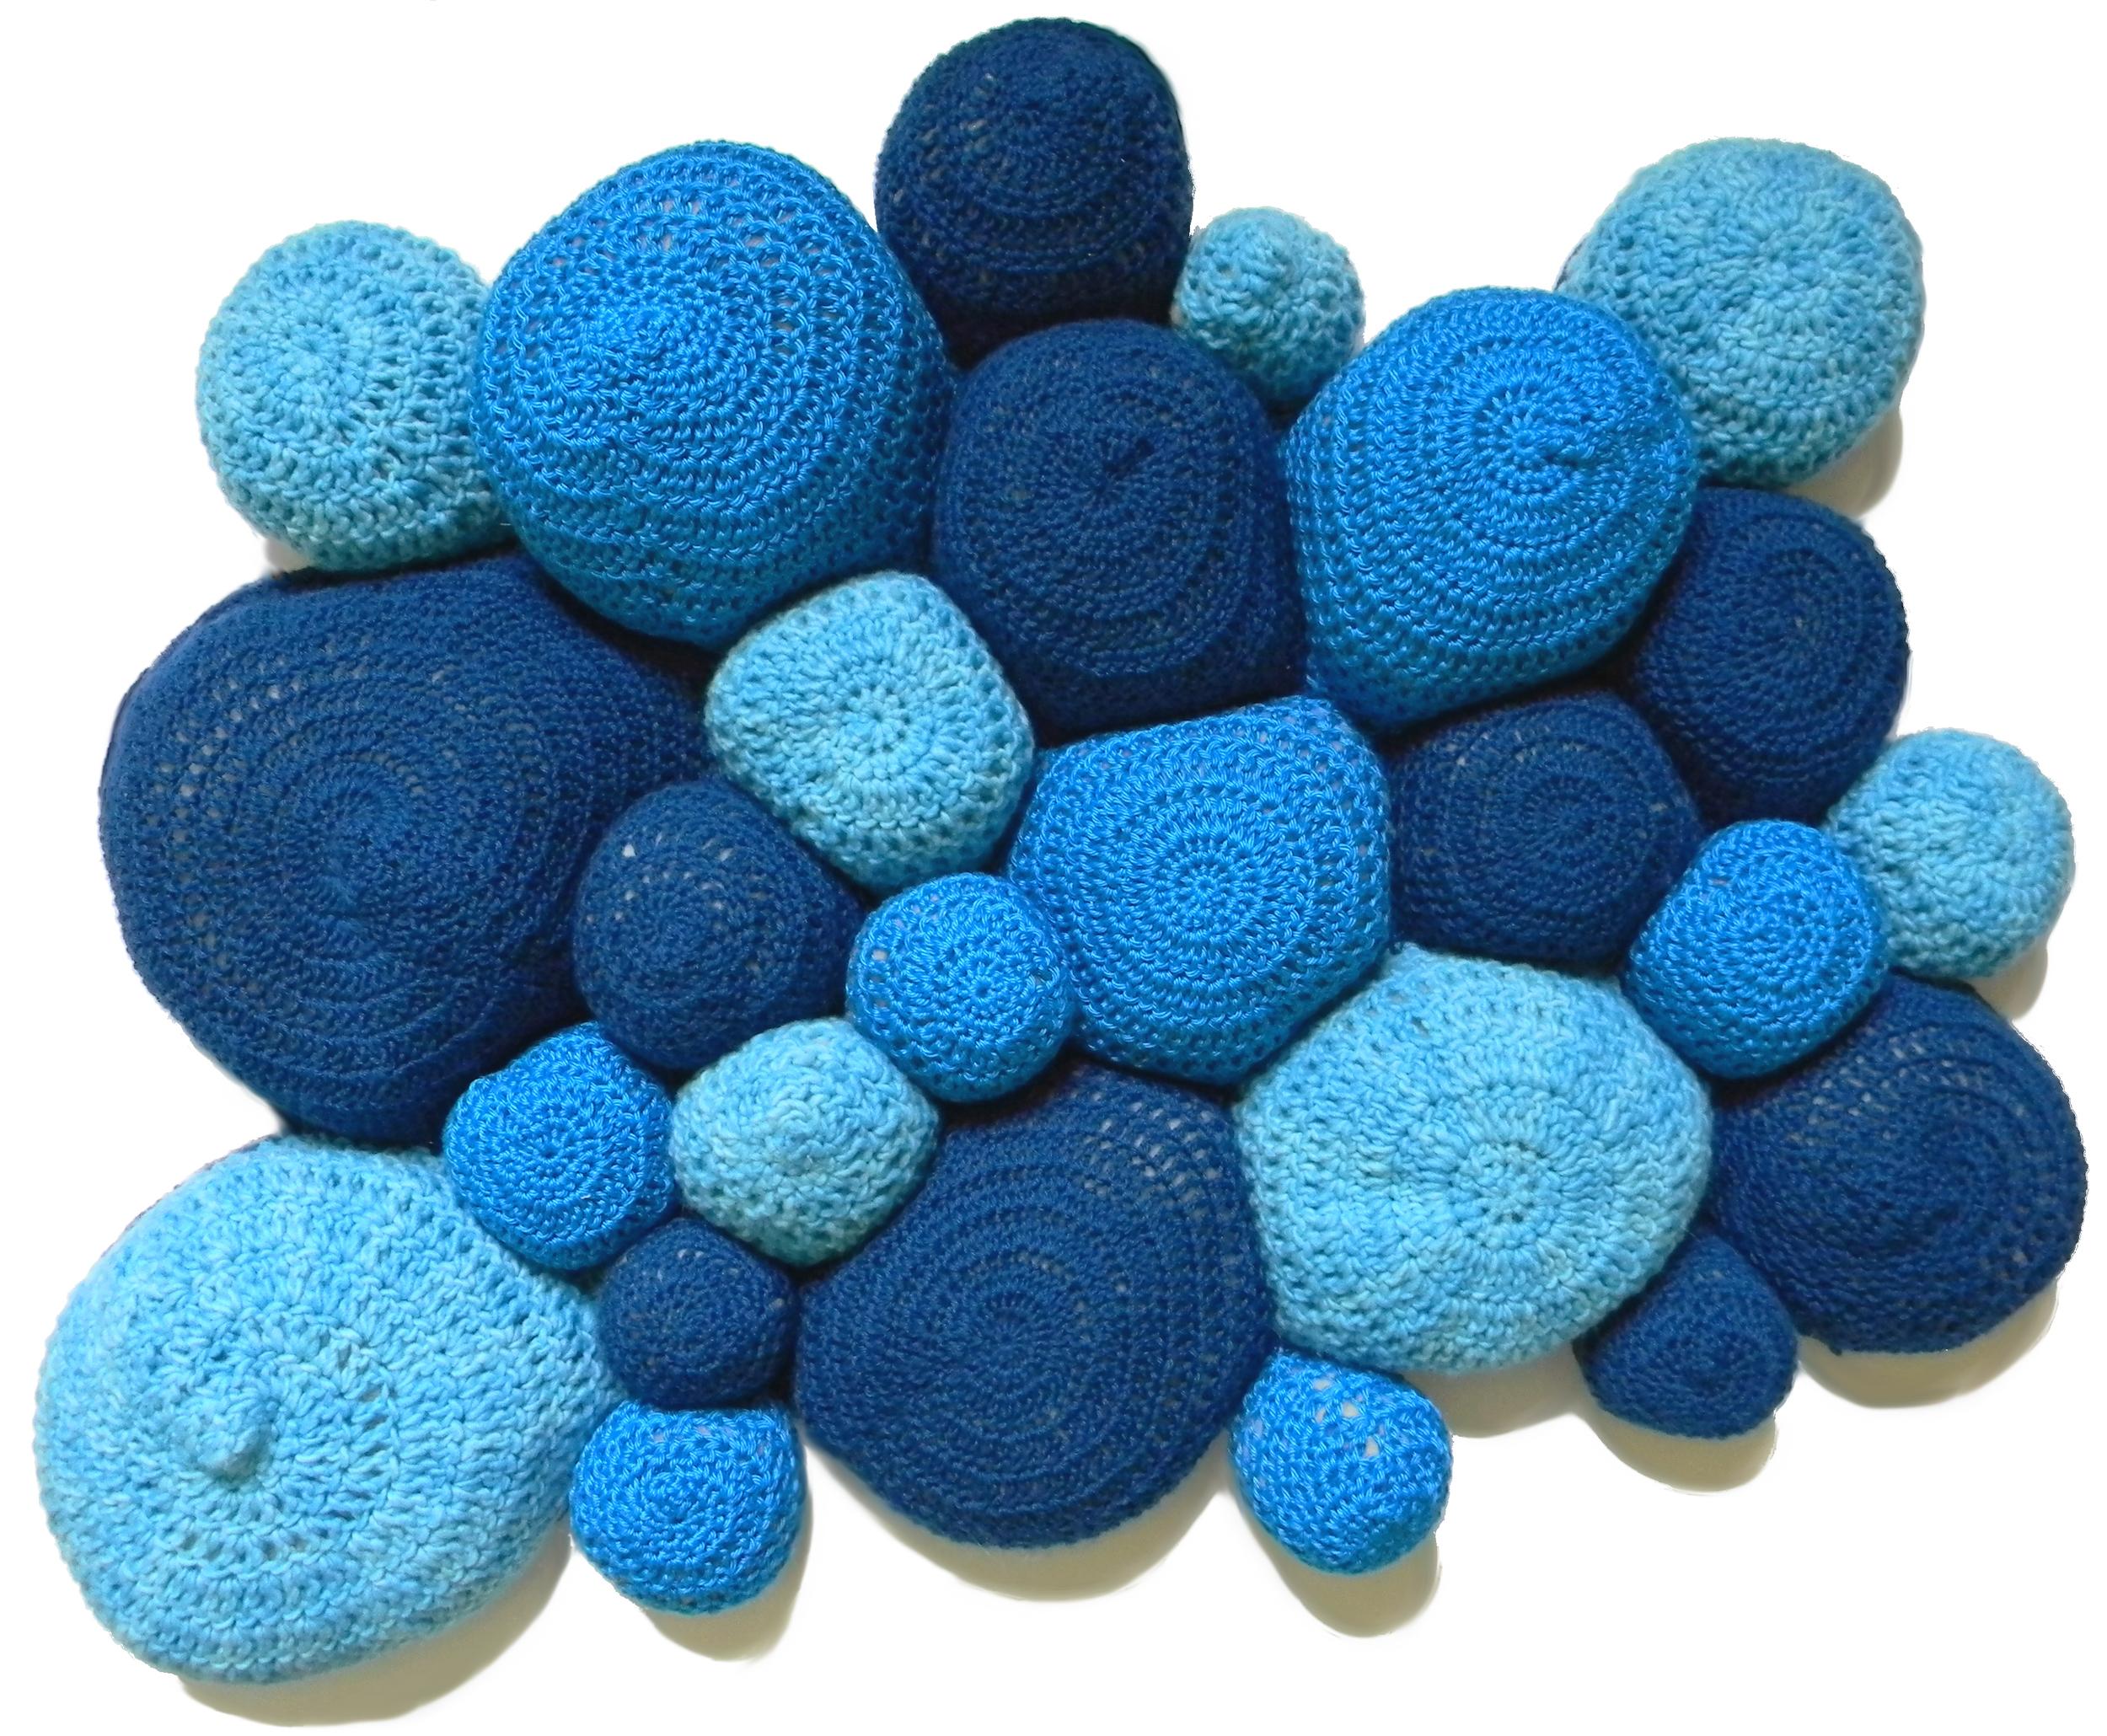 NOW $770, custom Malachos Small : Blue